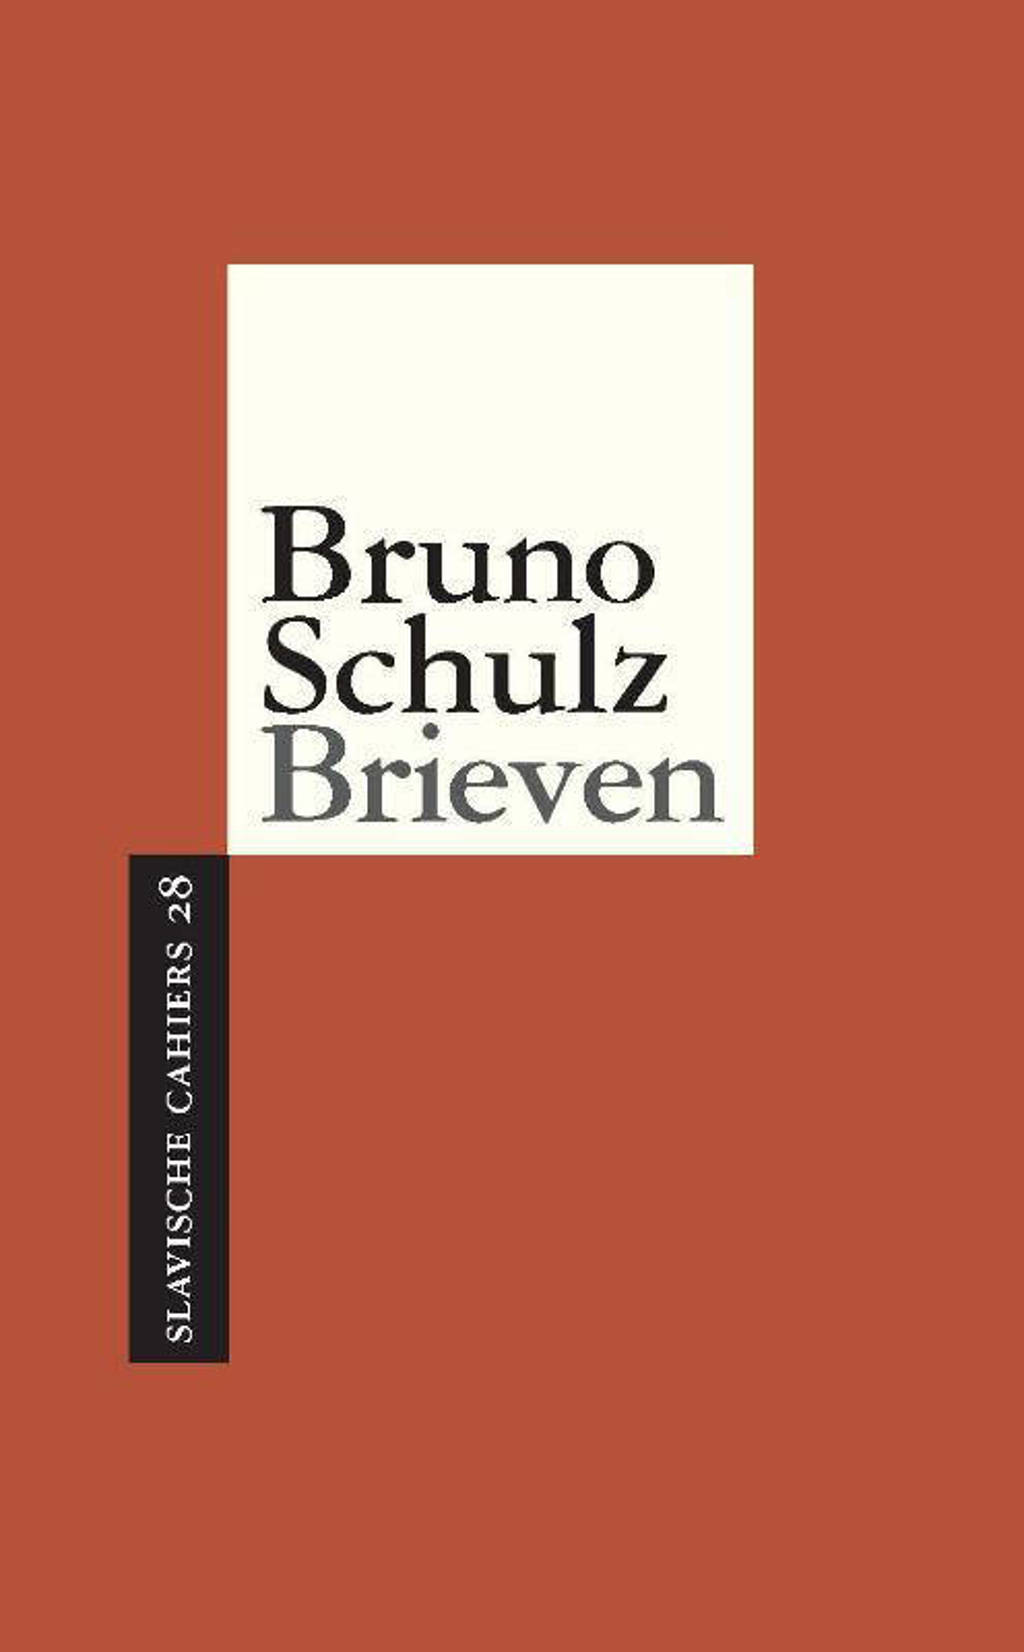 Slavische Cahiers: Brieven - Bruno Schulz